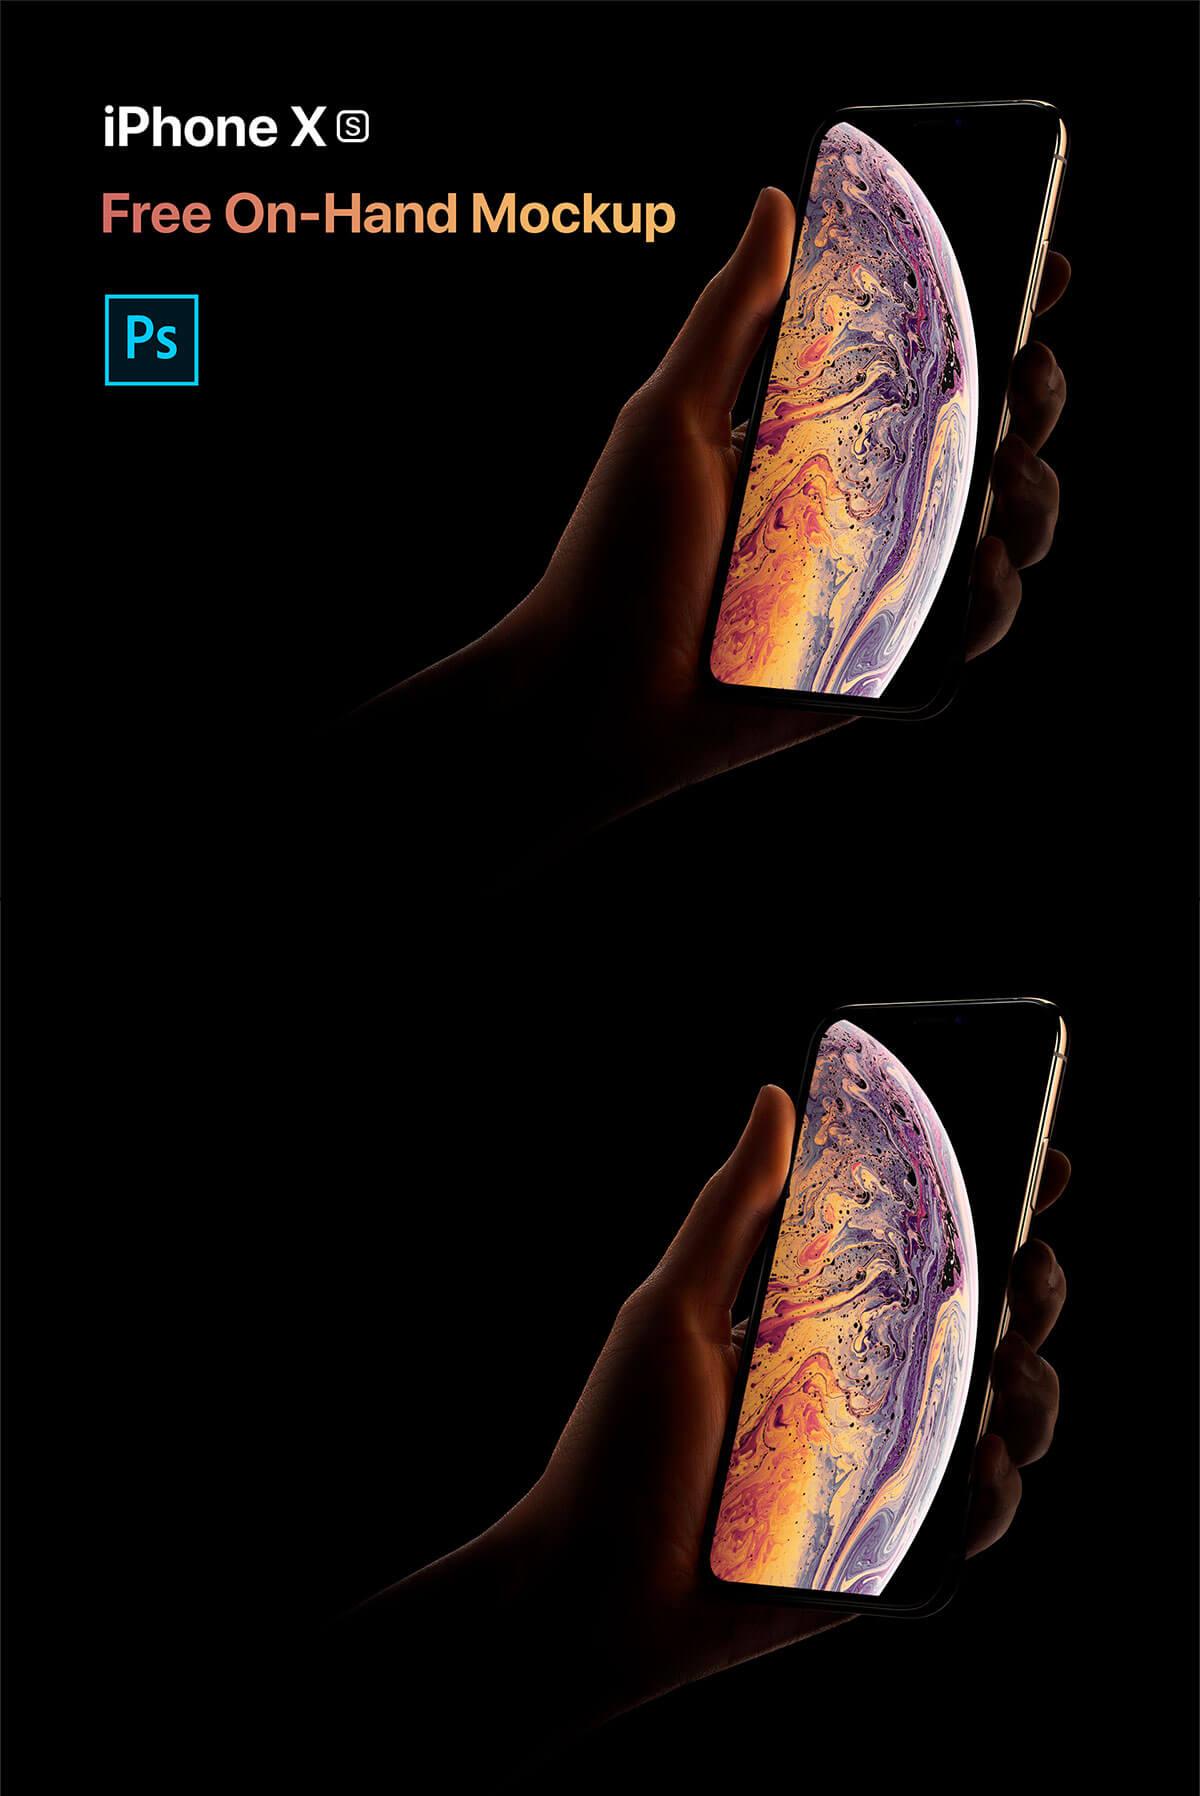 Free iPhone XS On Hand Mockup